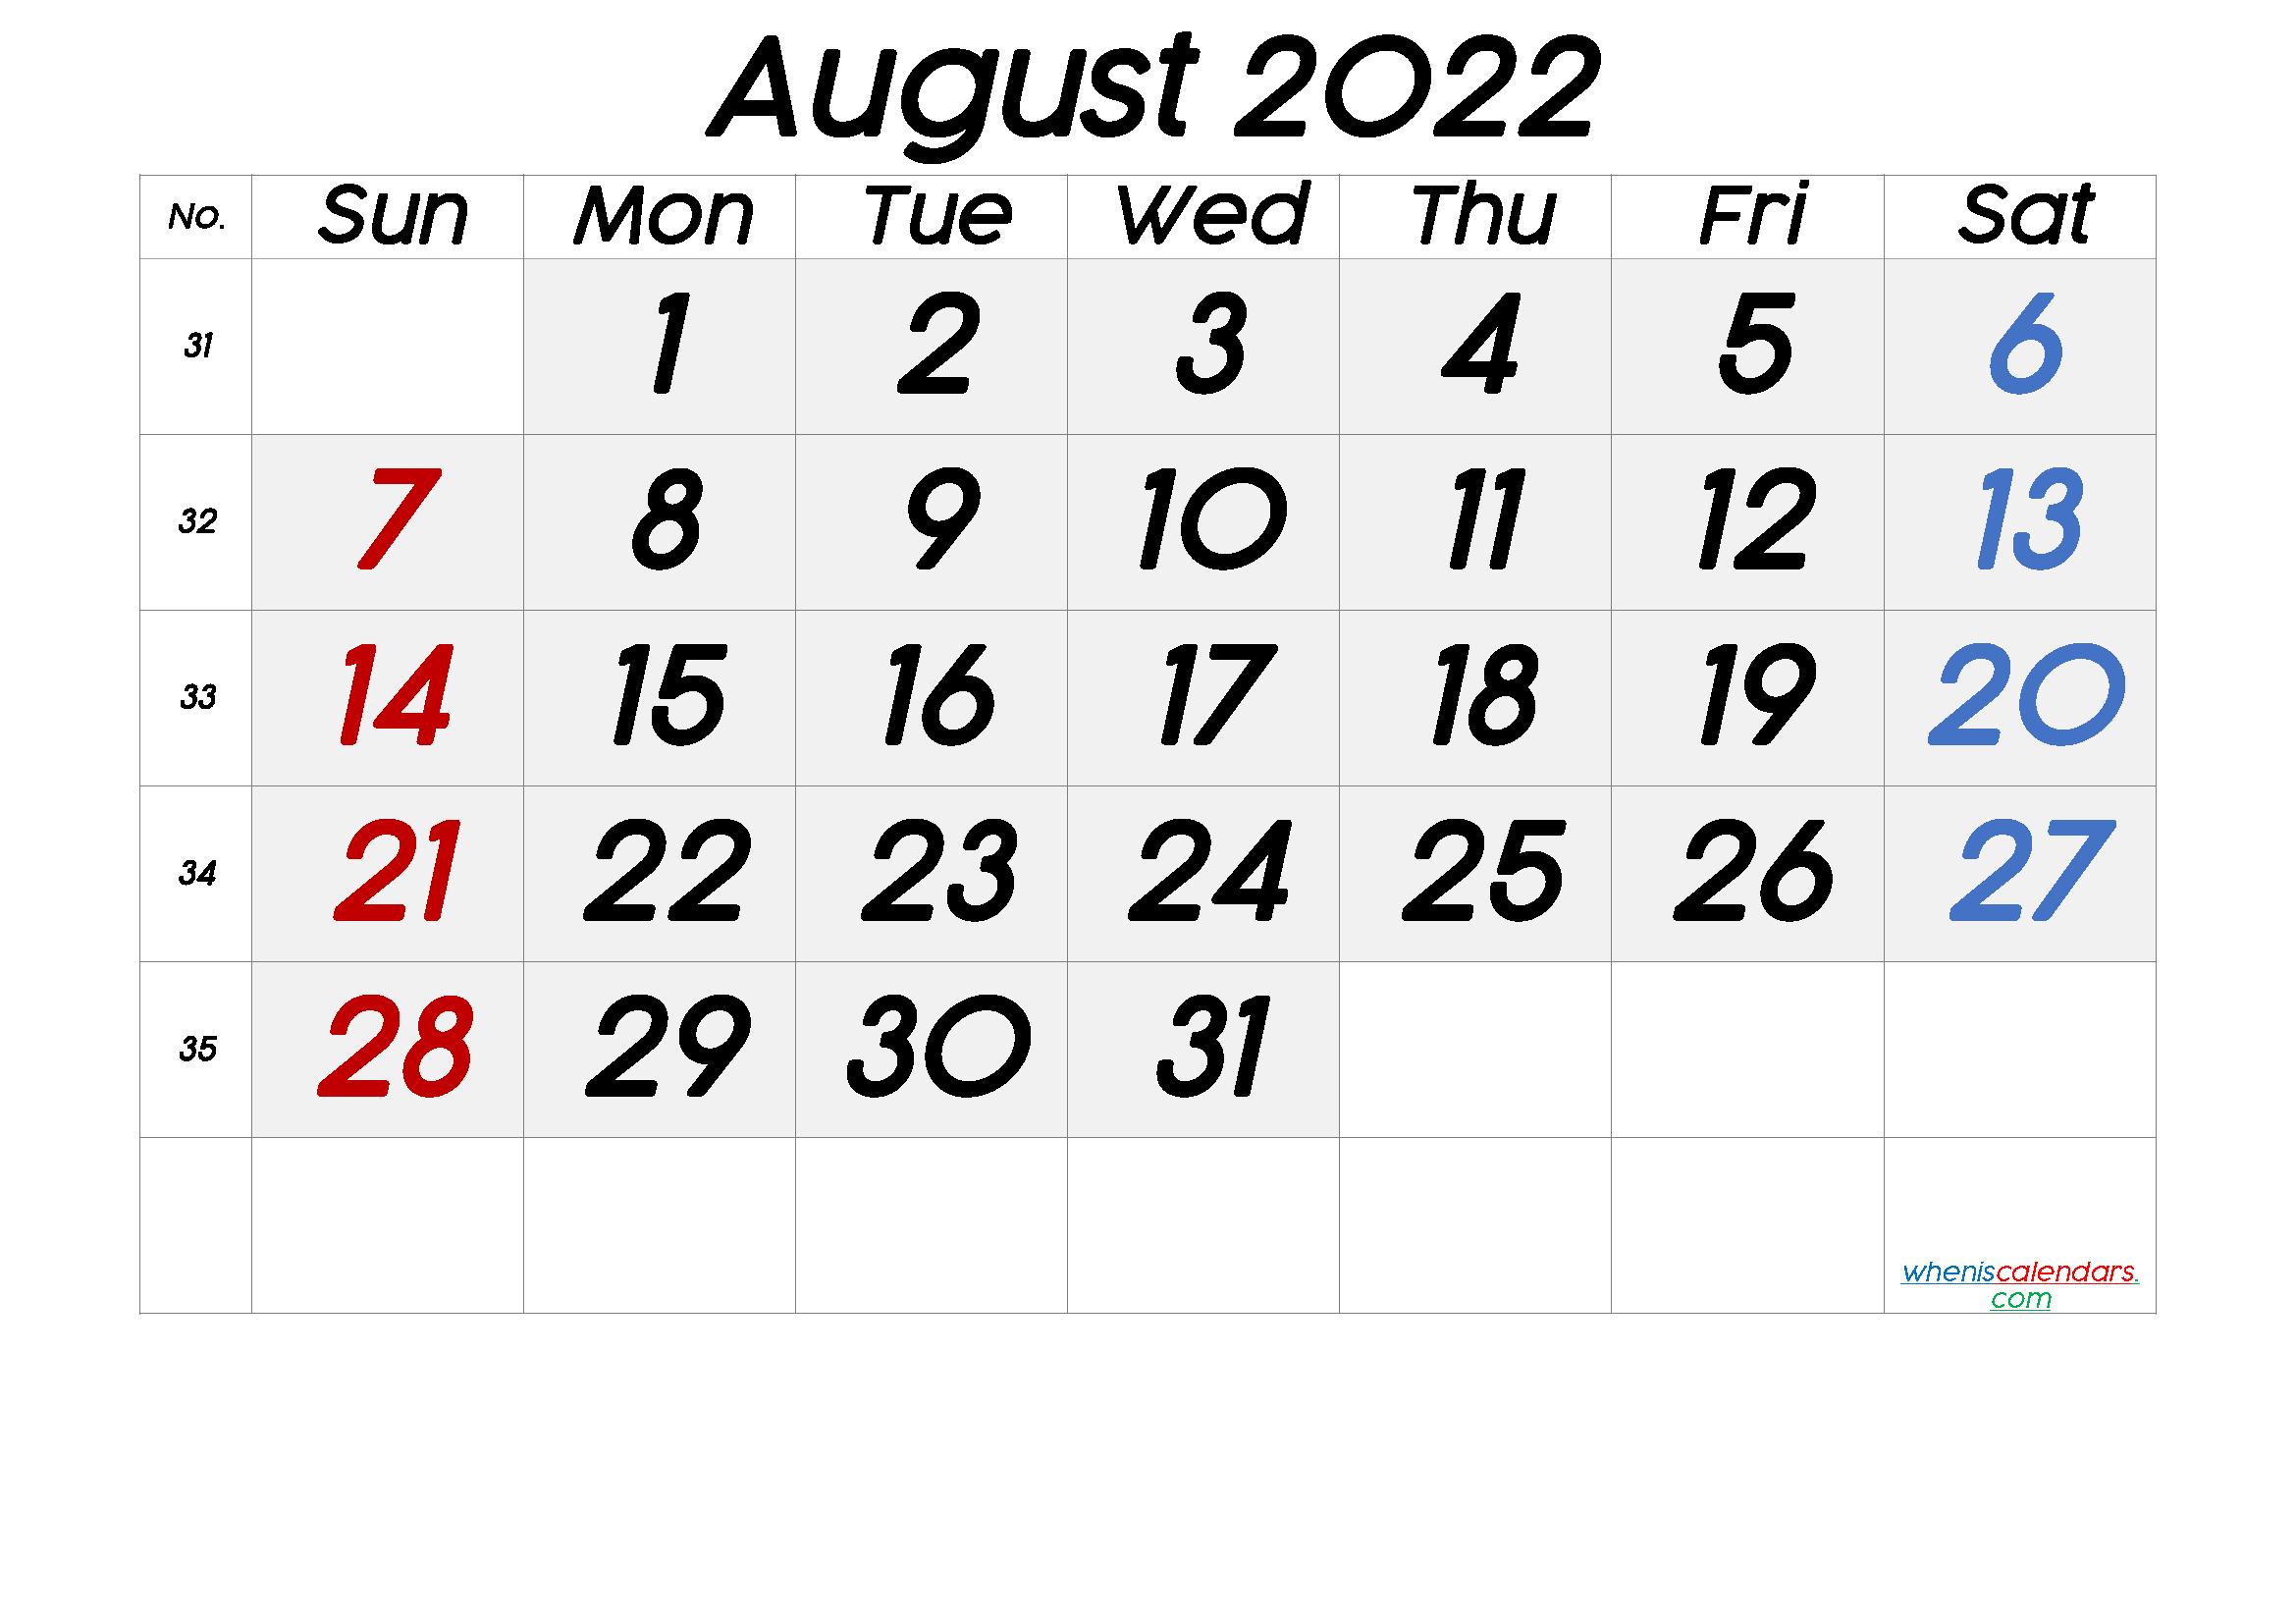 August 2022 Printable Calendar